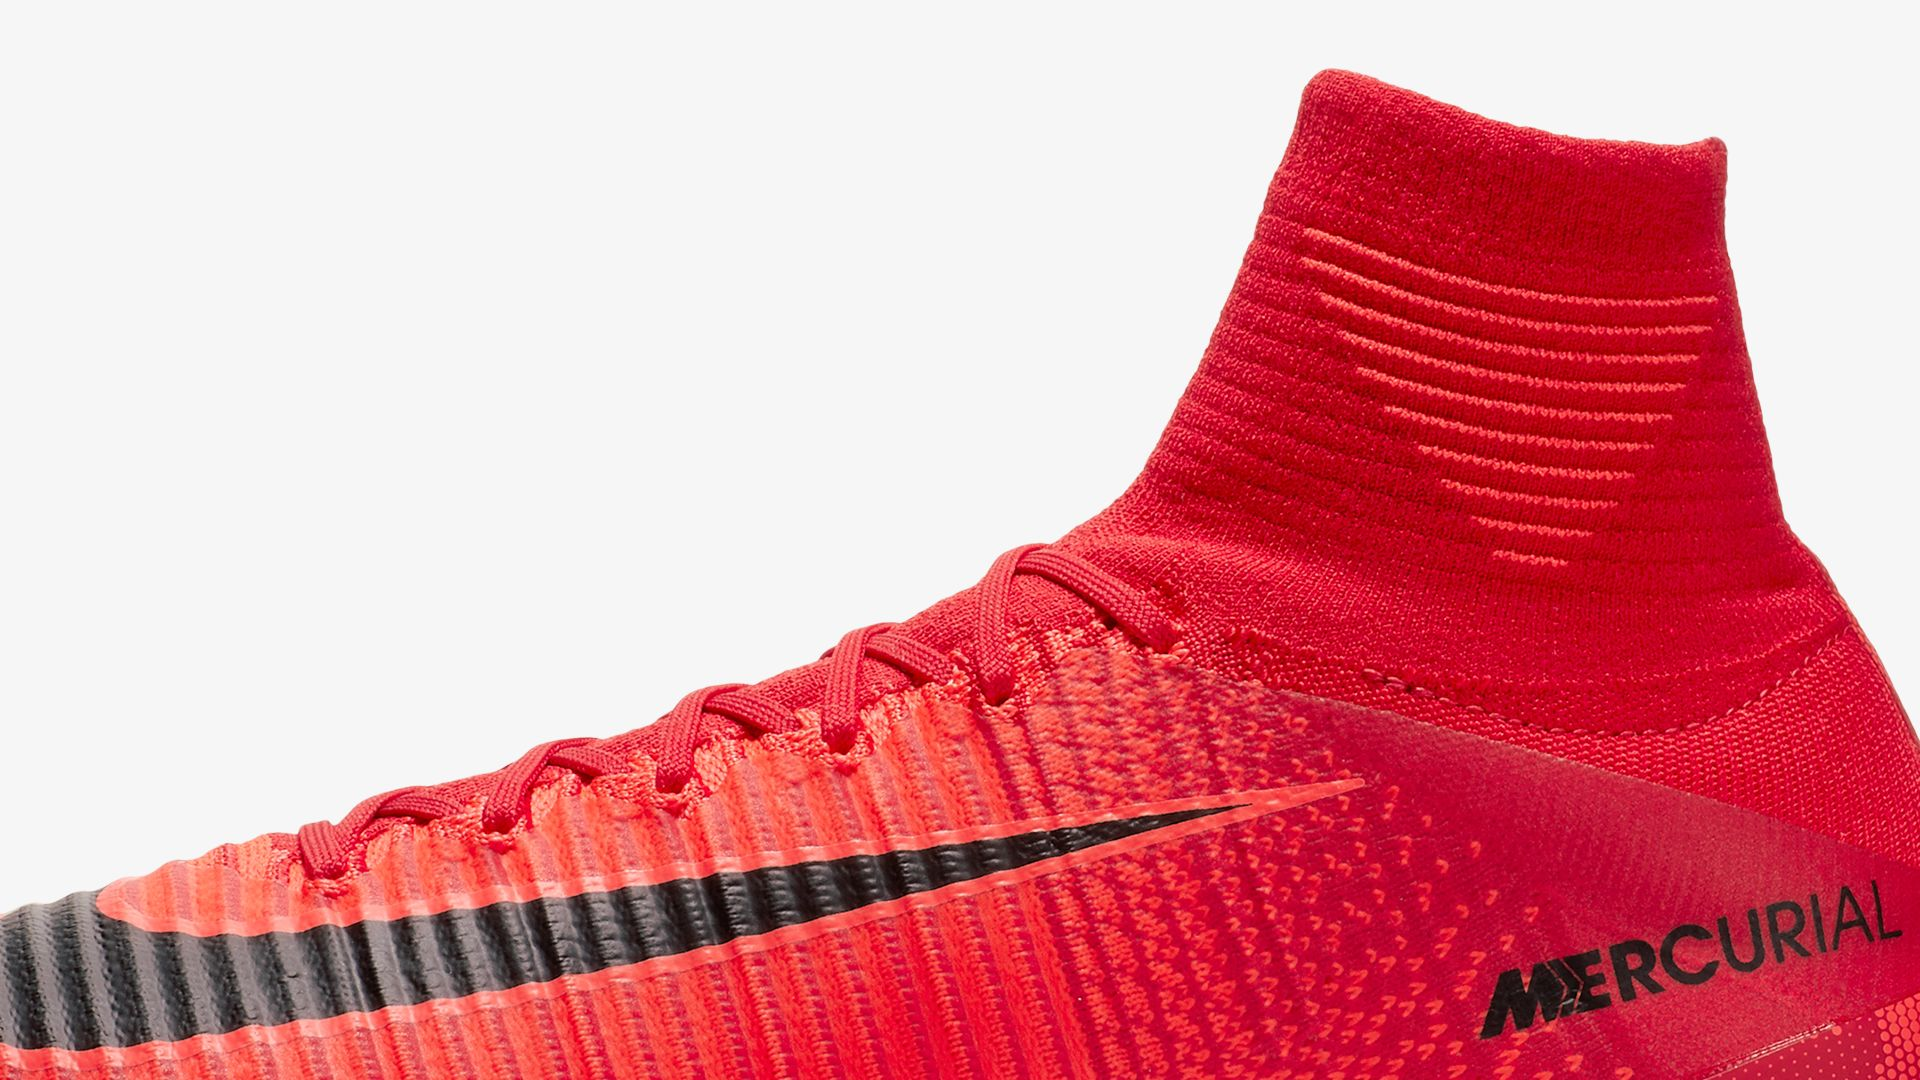 fbec6d3231a4 Nike Play FireMercurial Superfly V. Nike.com